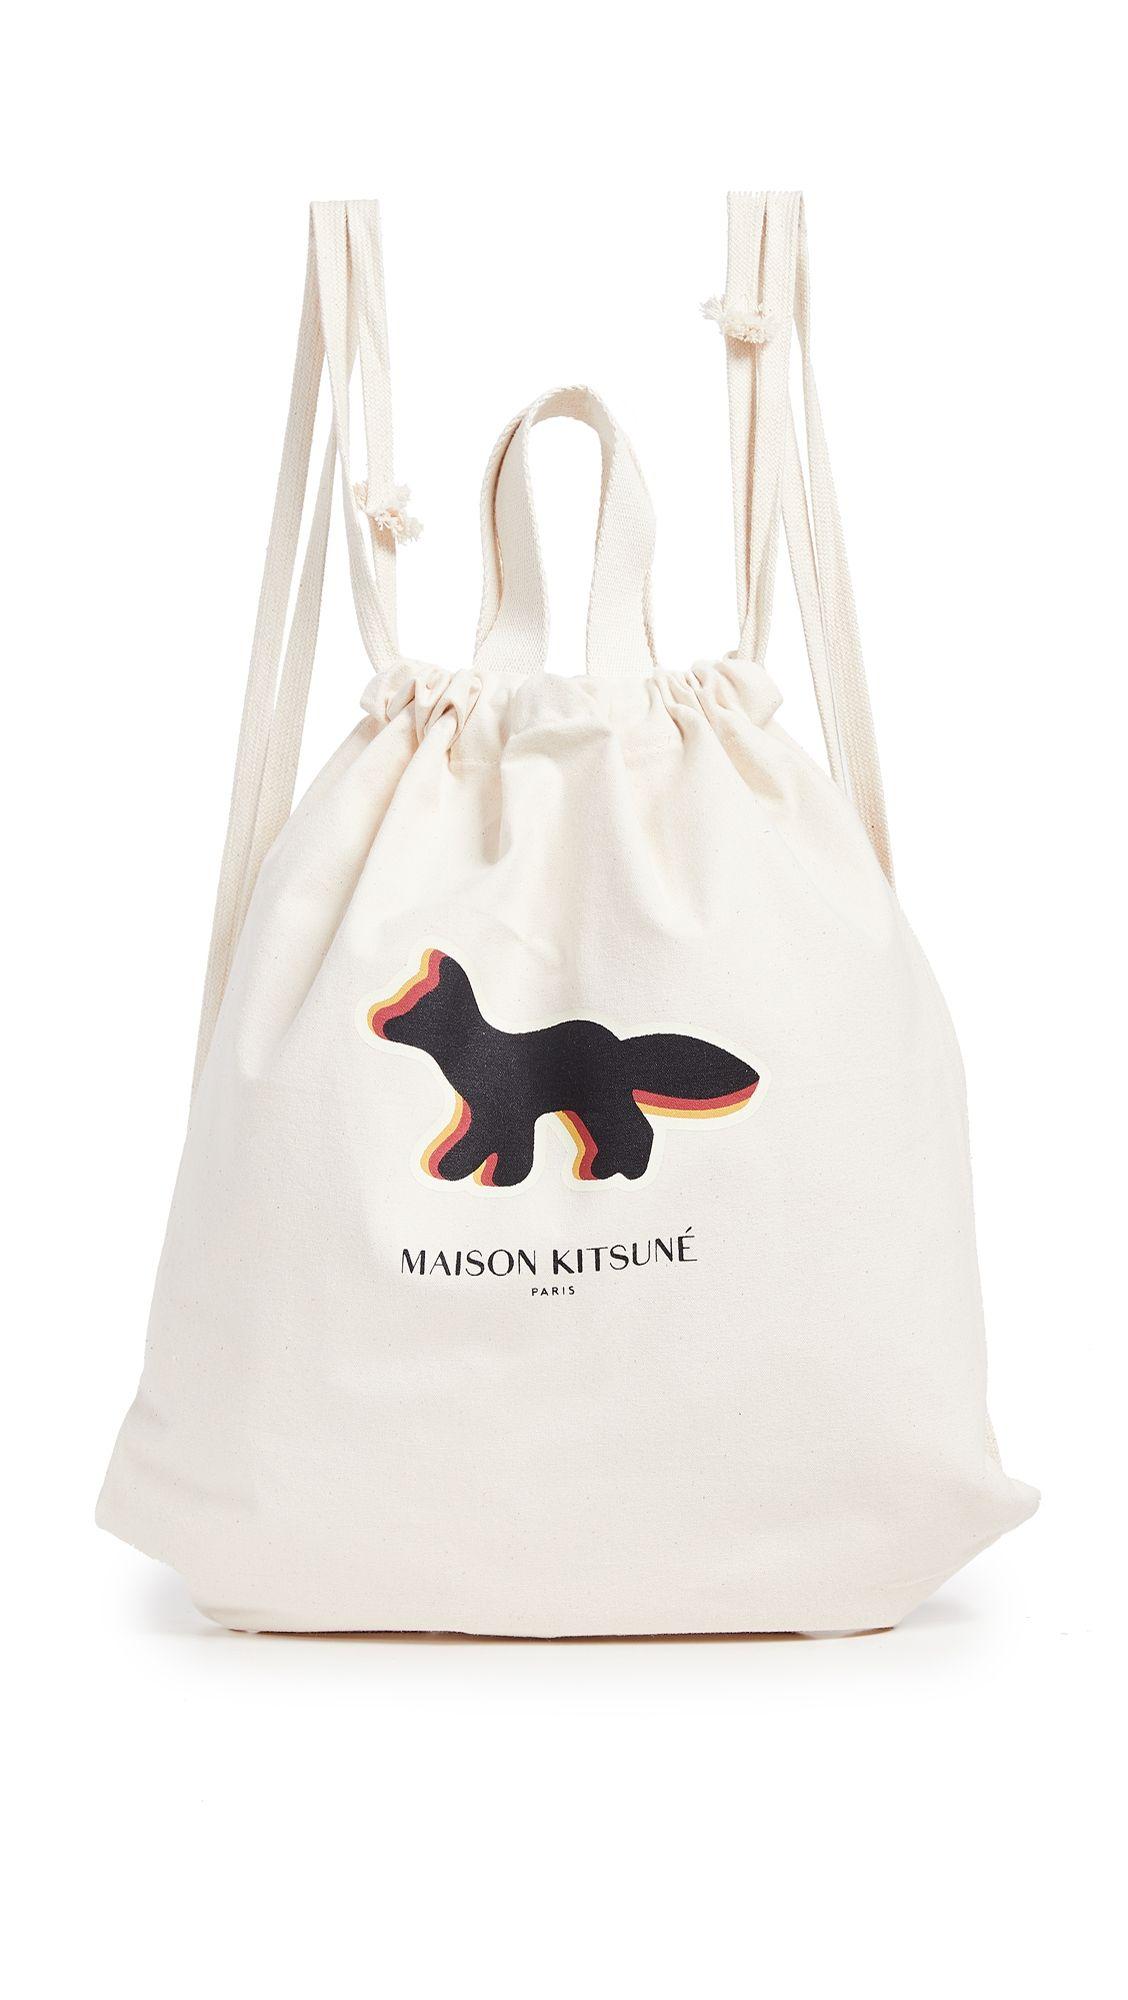 a8198dfcbf MAISON KITSUNÉ QUADRI FOX TOTE BACKPACK.  maisonkitsuné  bags  canvas   backpacks